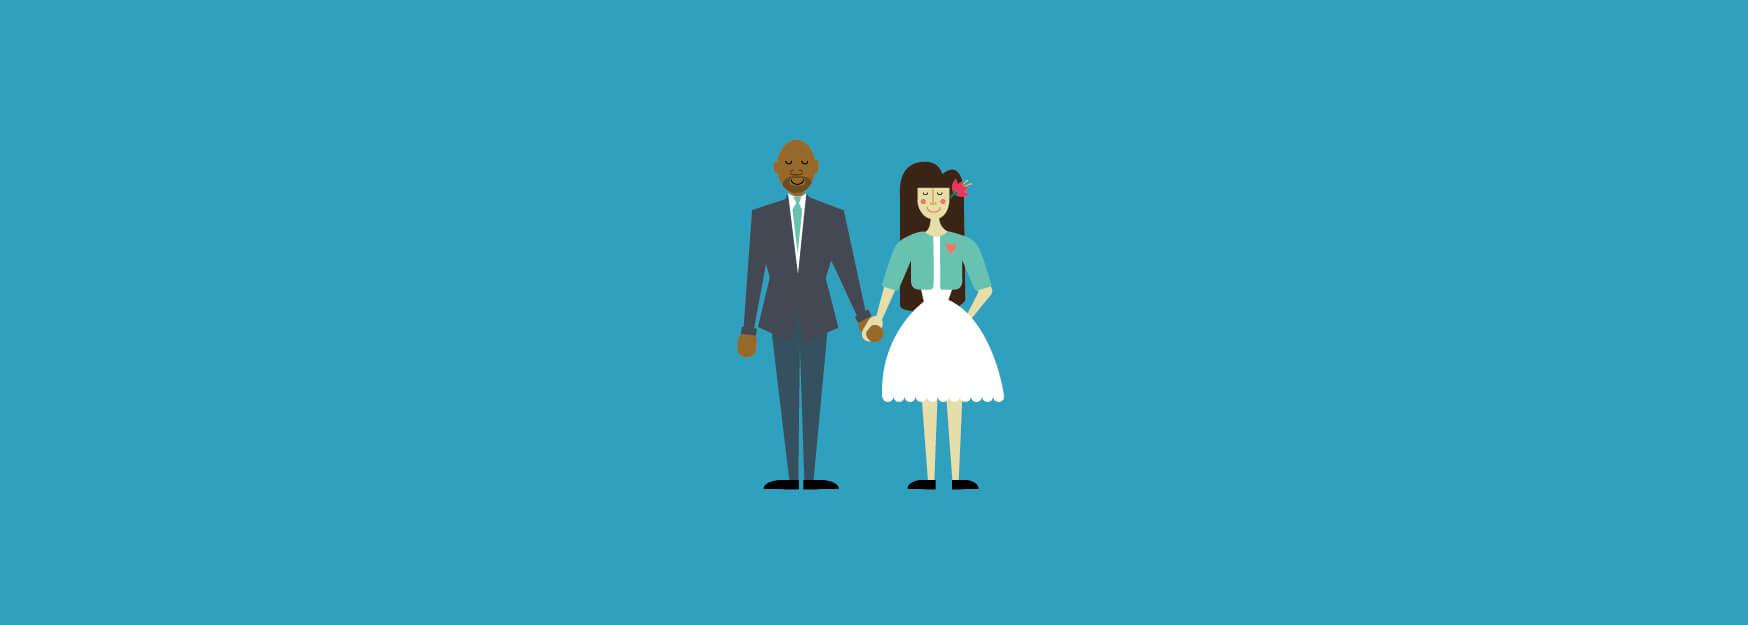 aurora creative studio graphic design illustration cape town portfolio wedding stationery